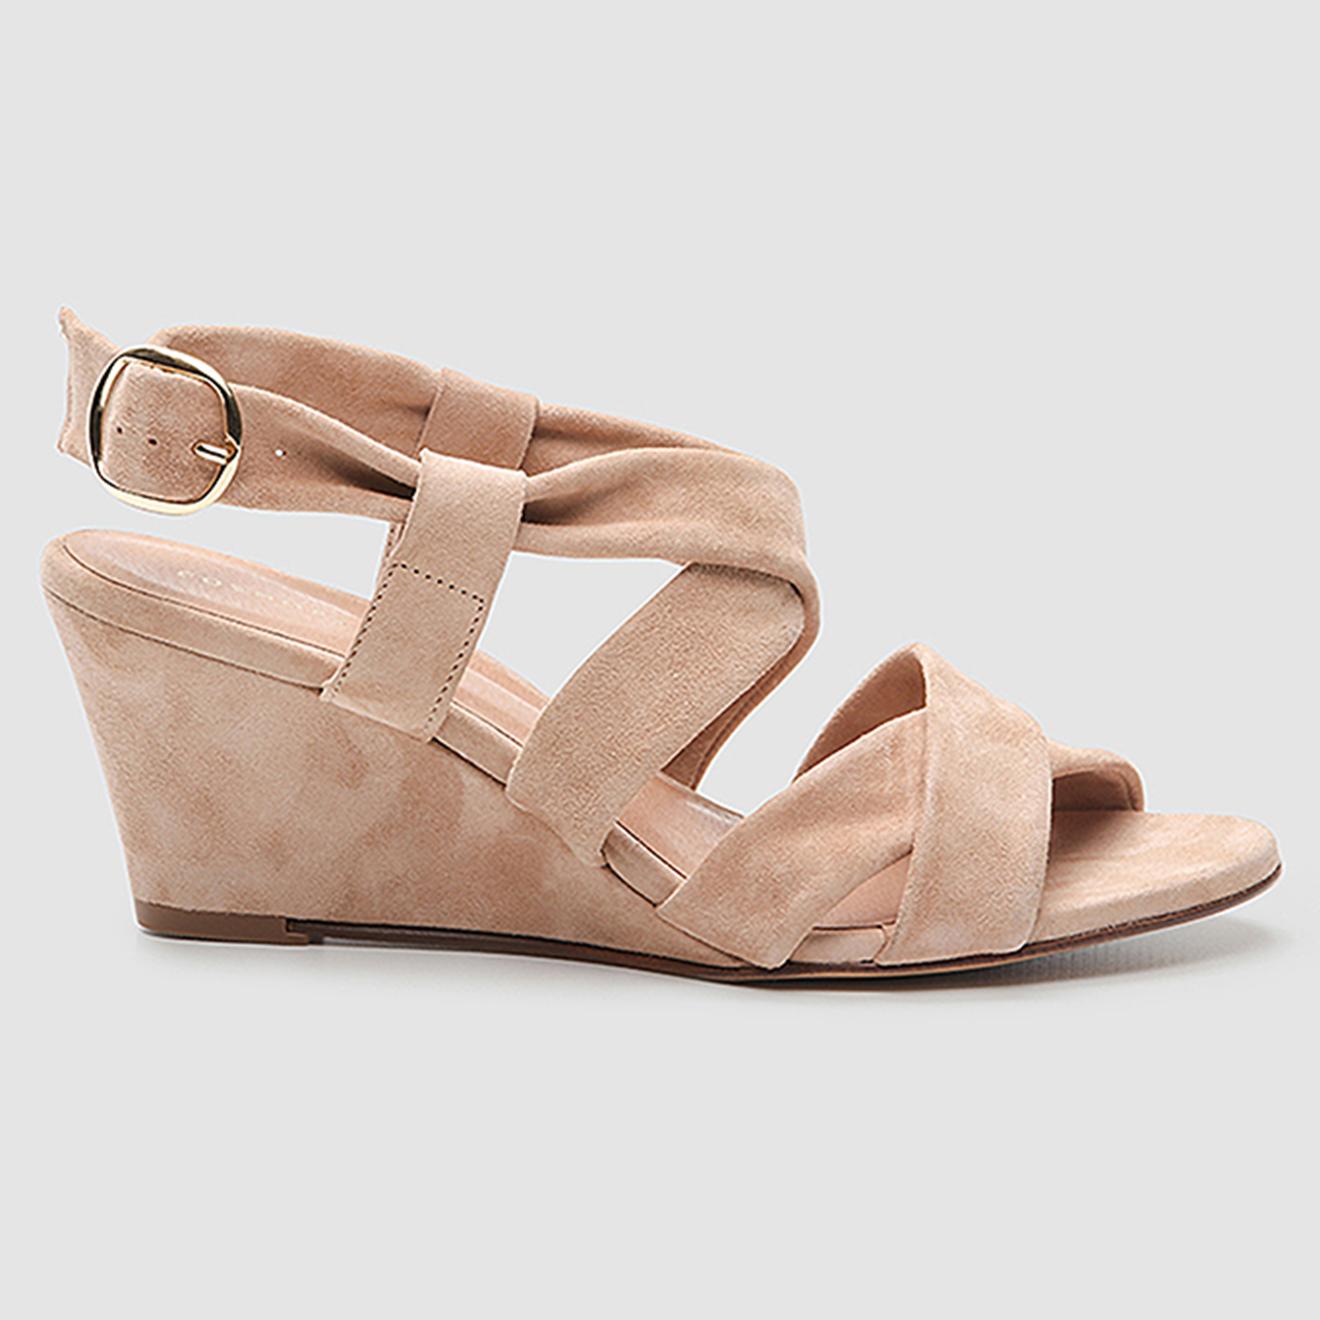 Sandales en Velours de Cuir Valiya - Talon 6 cm - Cosmoparis - Modalova